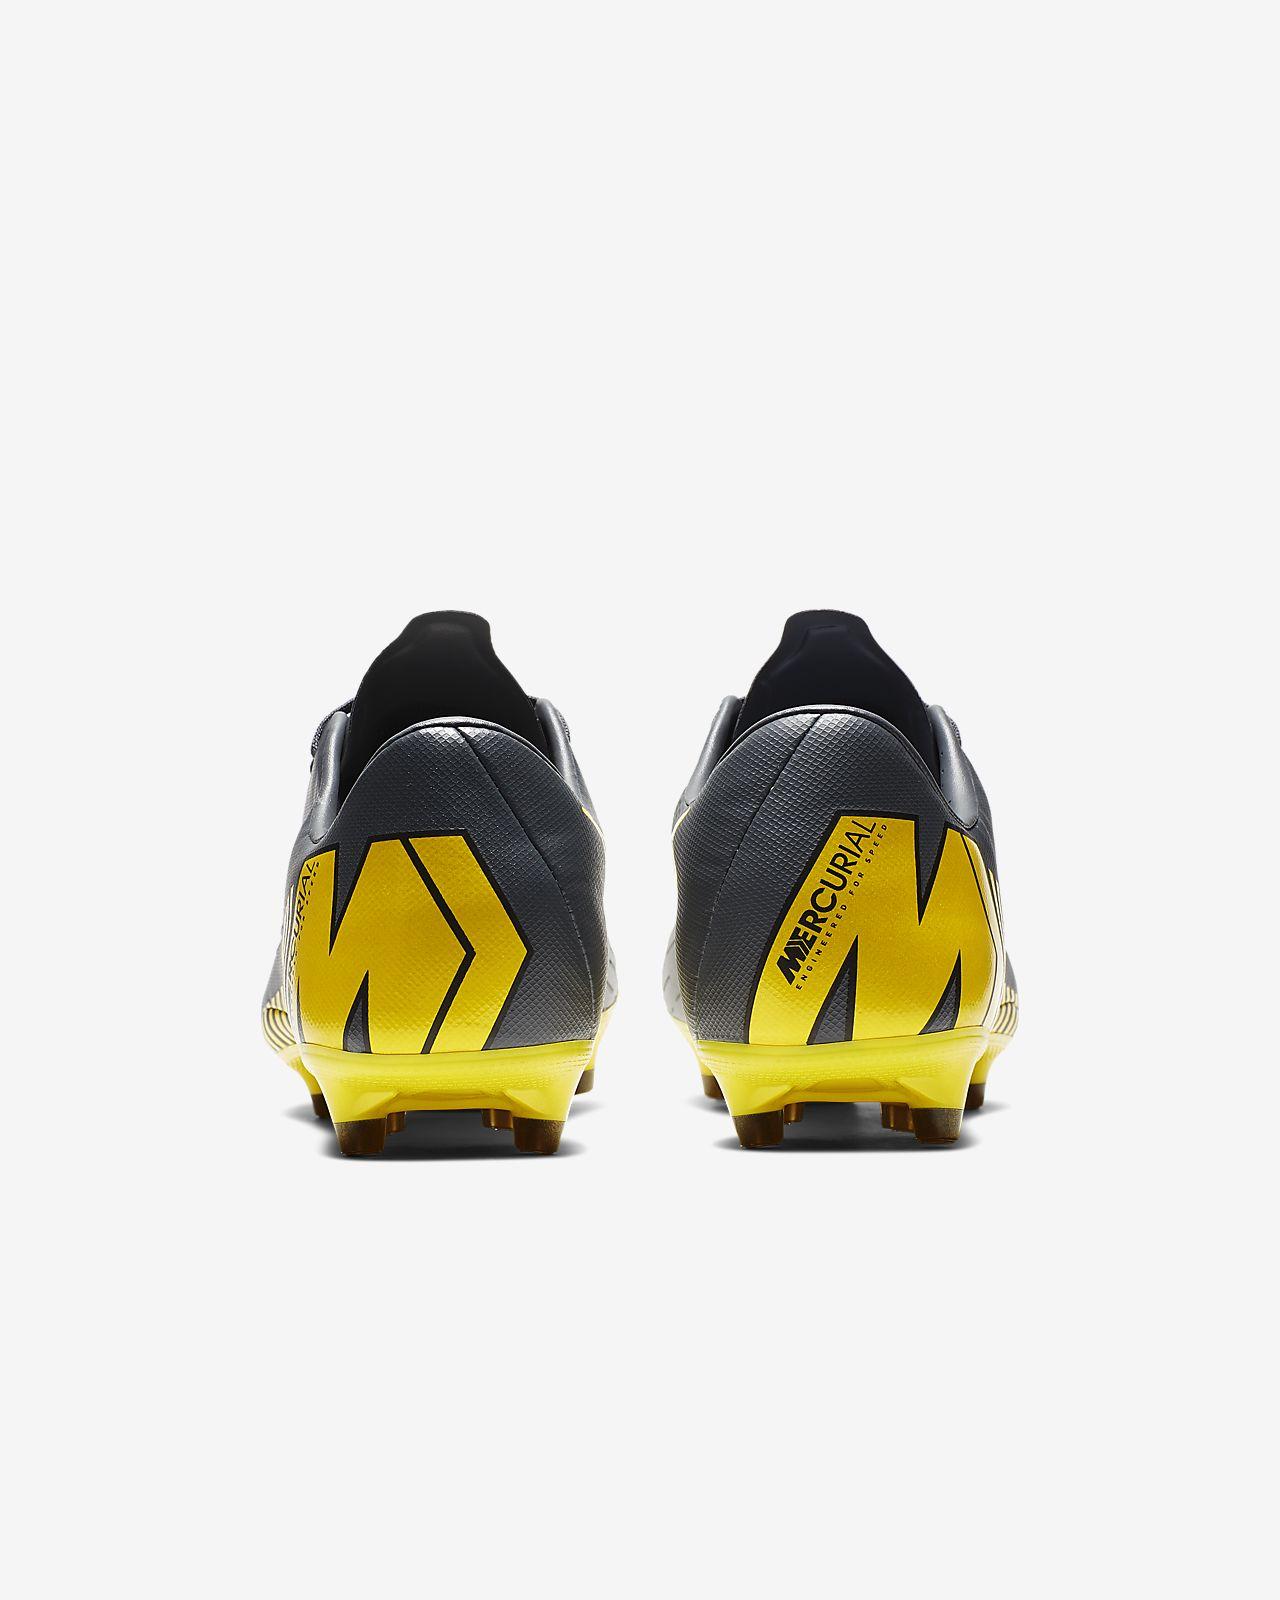 dae5c37bef0 Nike Mercurial Vapor XII Pro AG-PRO Artificial-Grass Football Boot ...